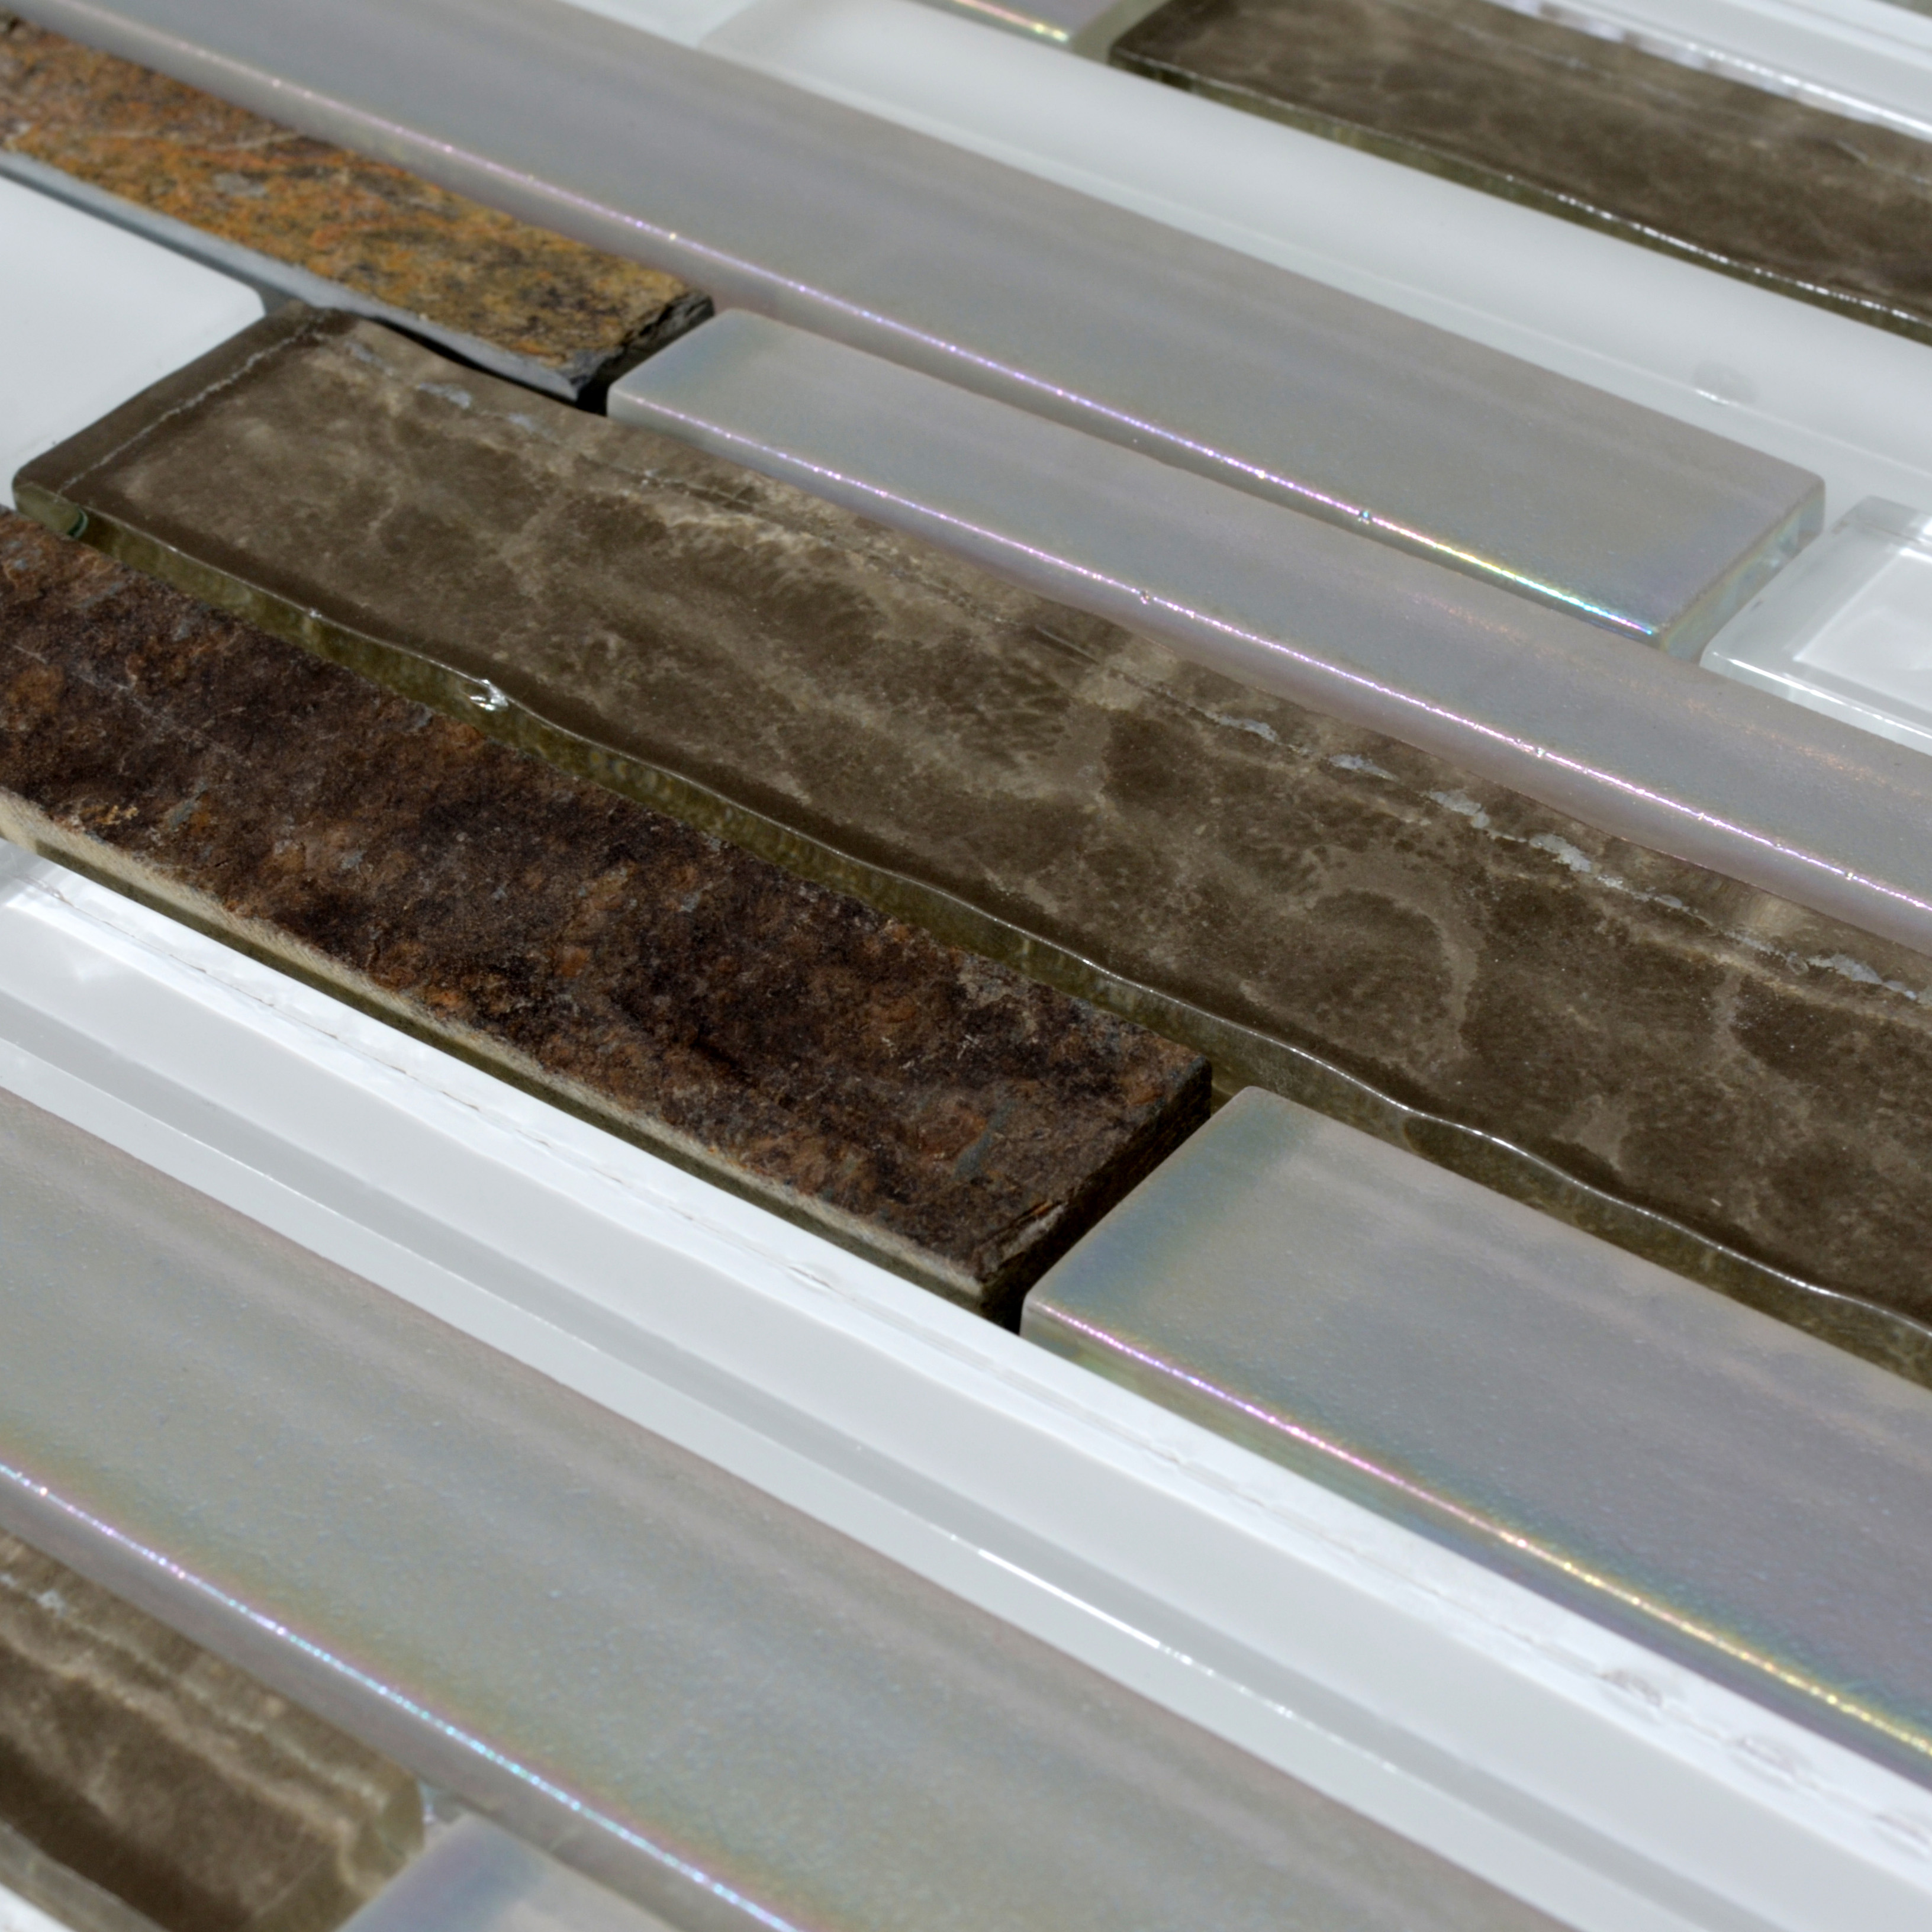 Wholesale Natural Stone With Crystal Mosaic Tile Sheet Marble Backsplash Wall Sticker Strip